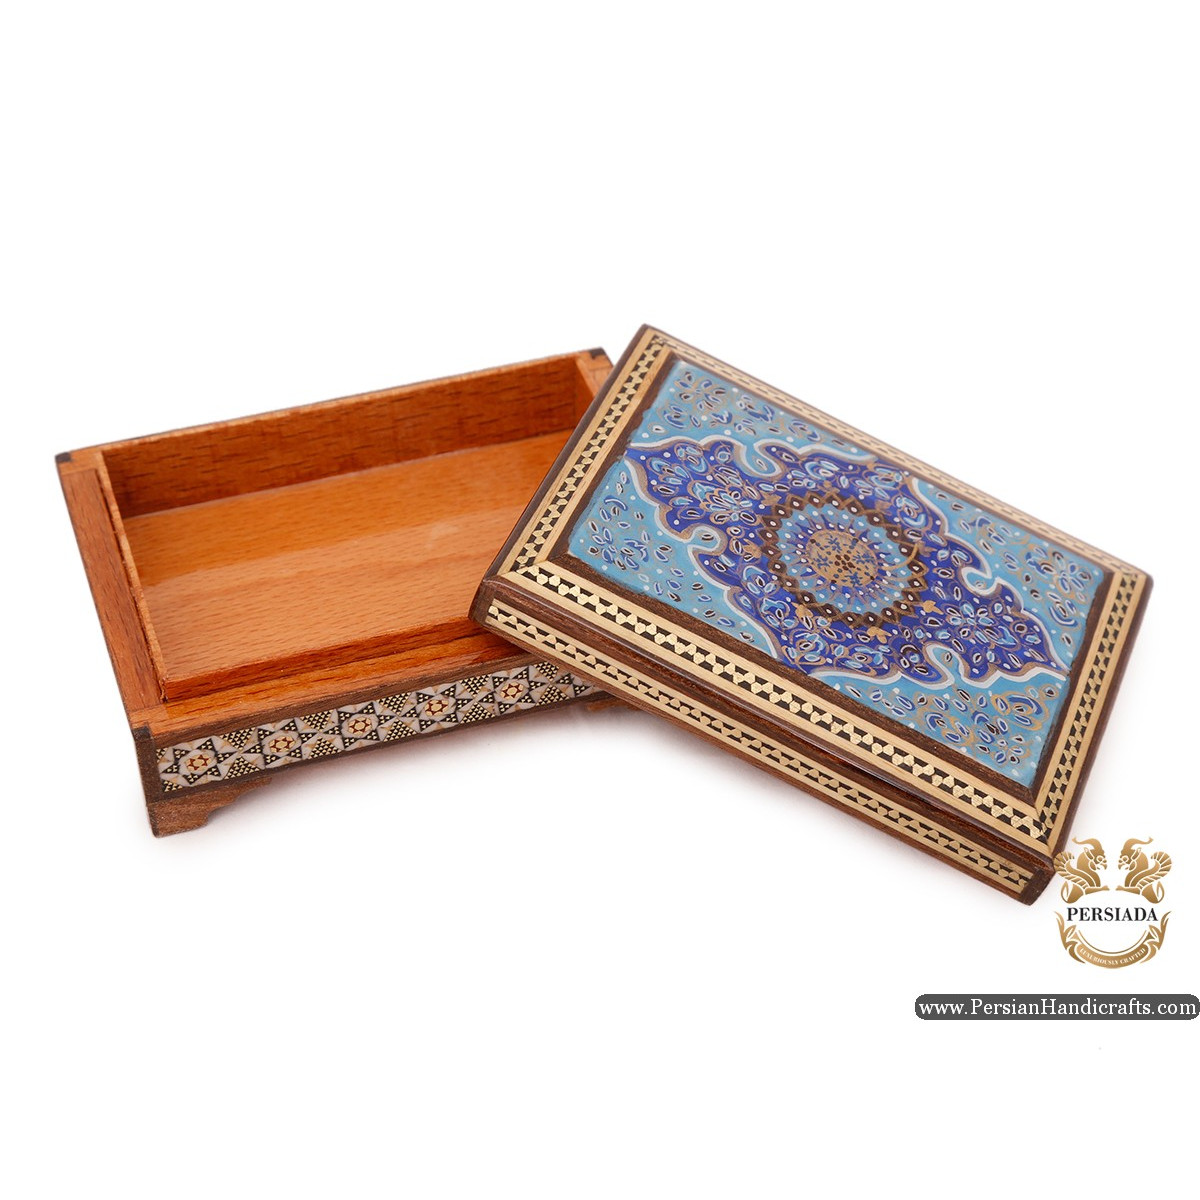 Mini Jewellery  Box | Miniature Khatam Marquetry | Persiada HKH6115